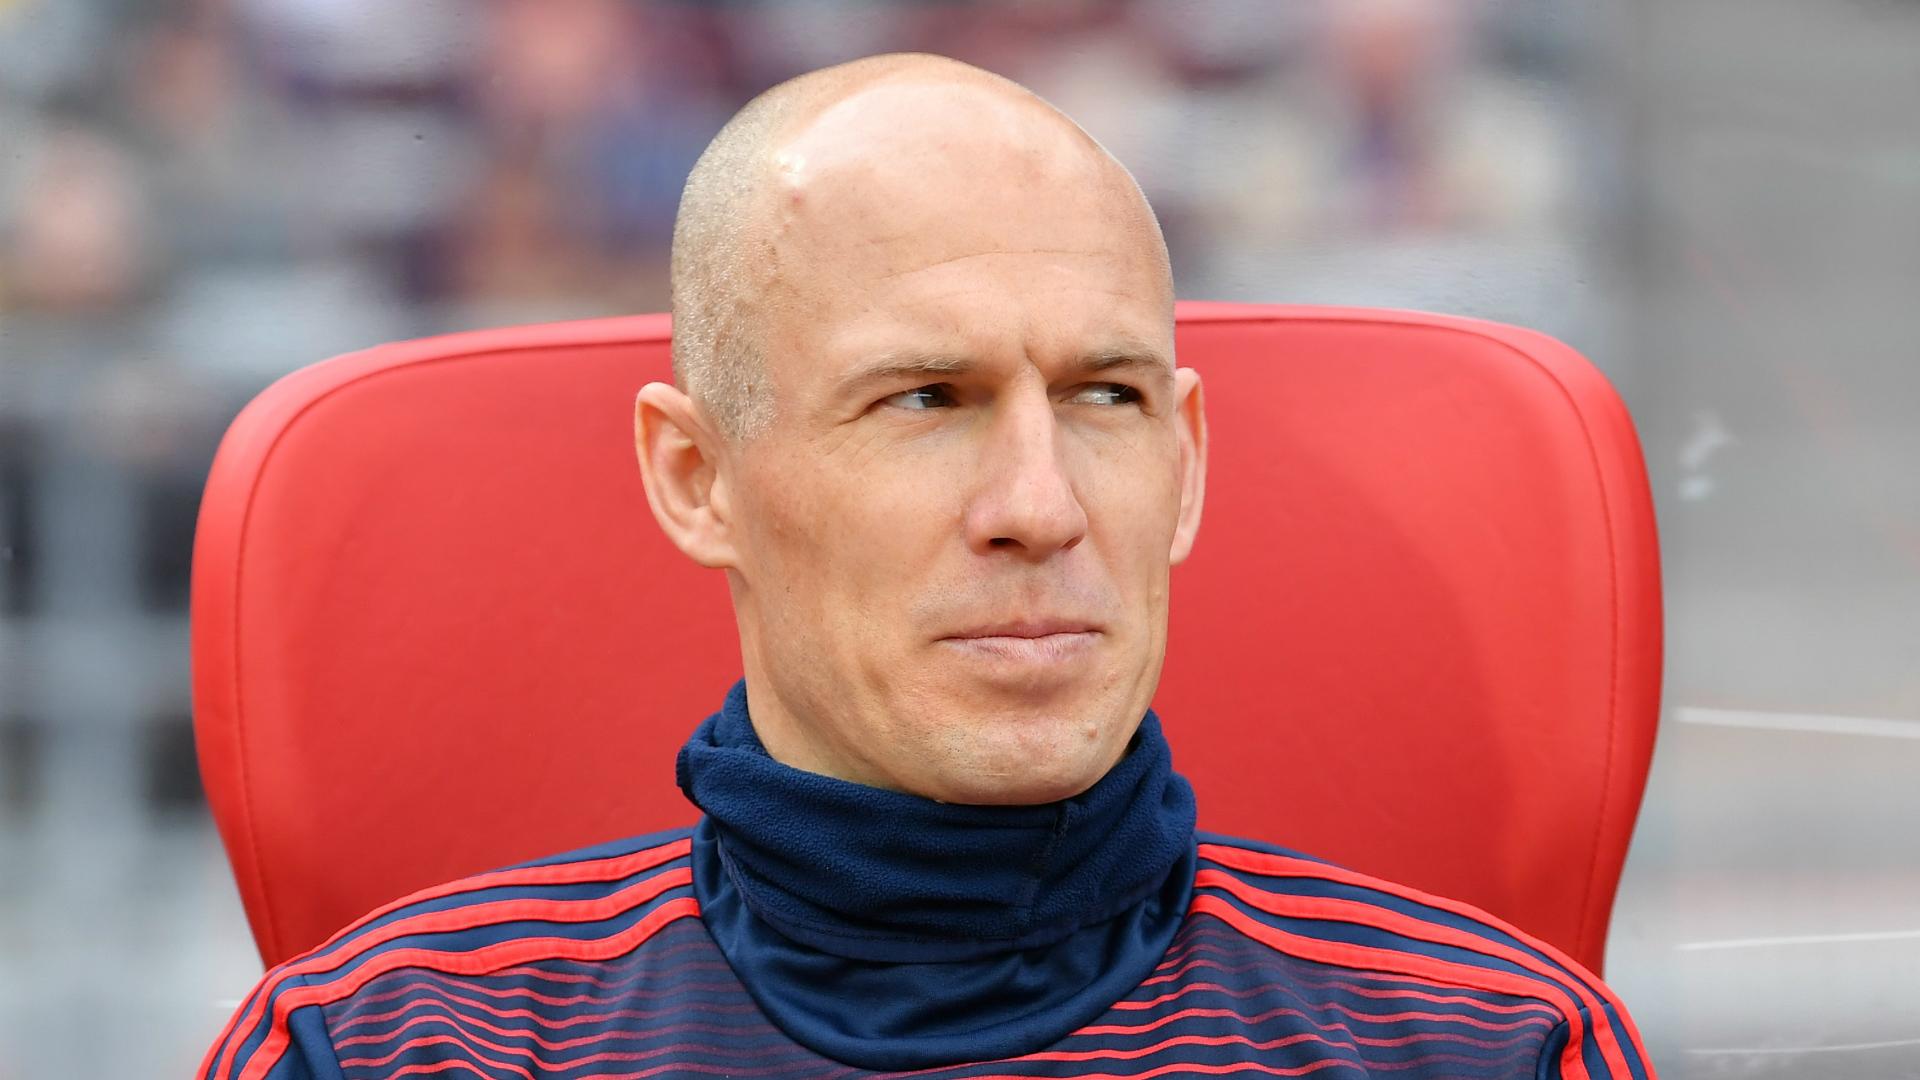 PSV would love to sign Robben – Van Bommel